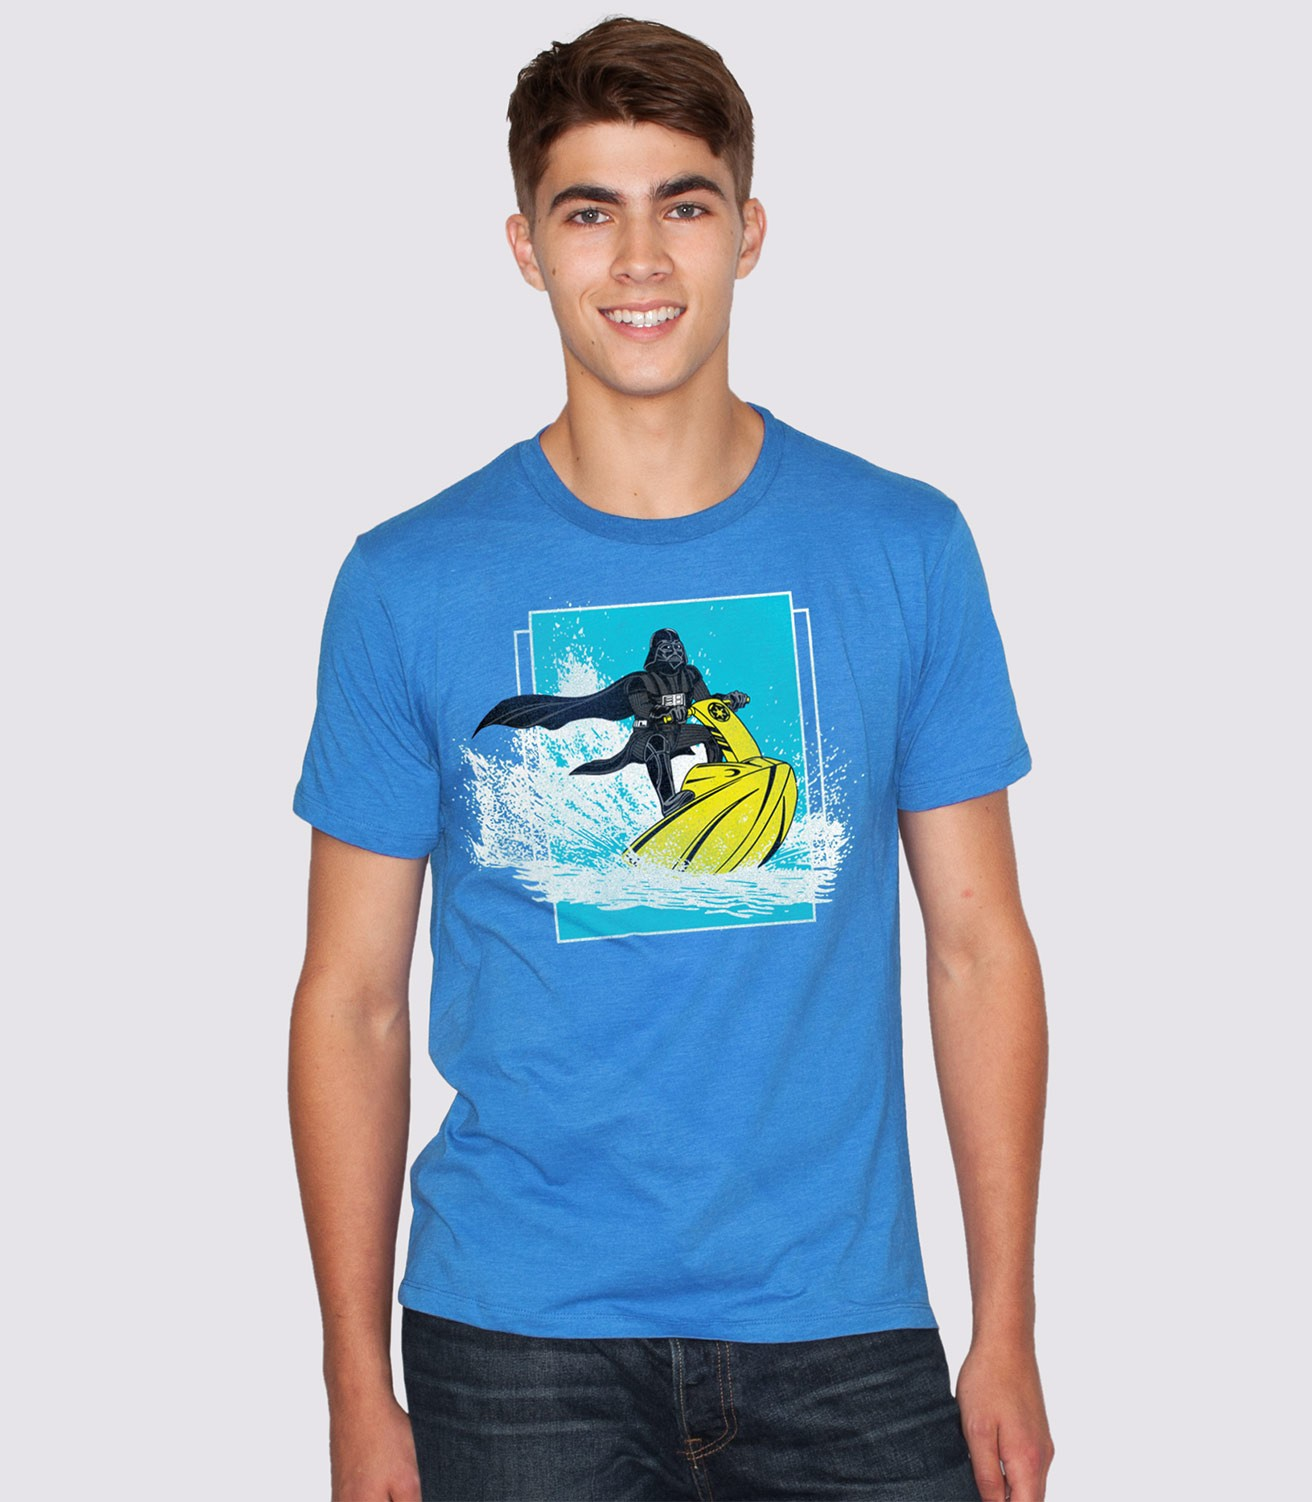 10bb2cd048 Return of the Jet Ski Men's Funny Darth Vader T-Shirt   Headline Shirts